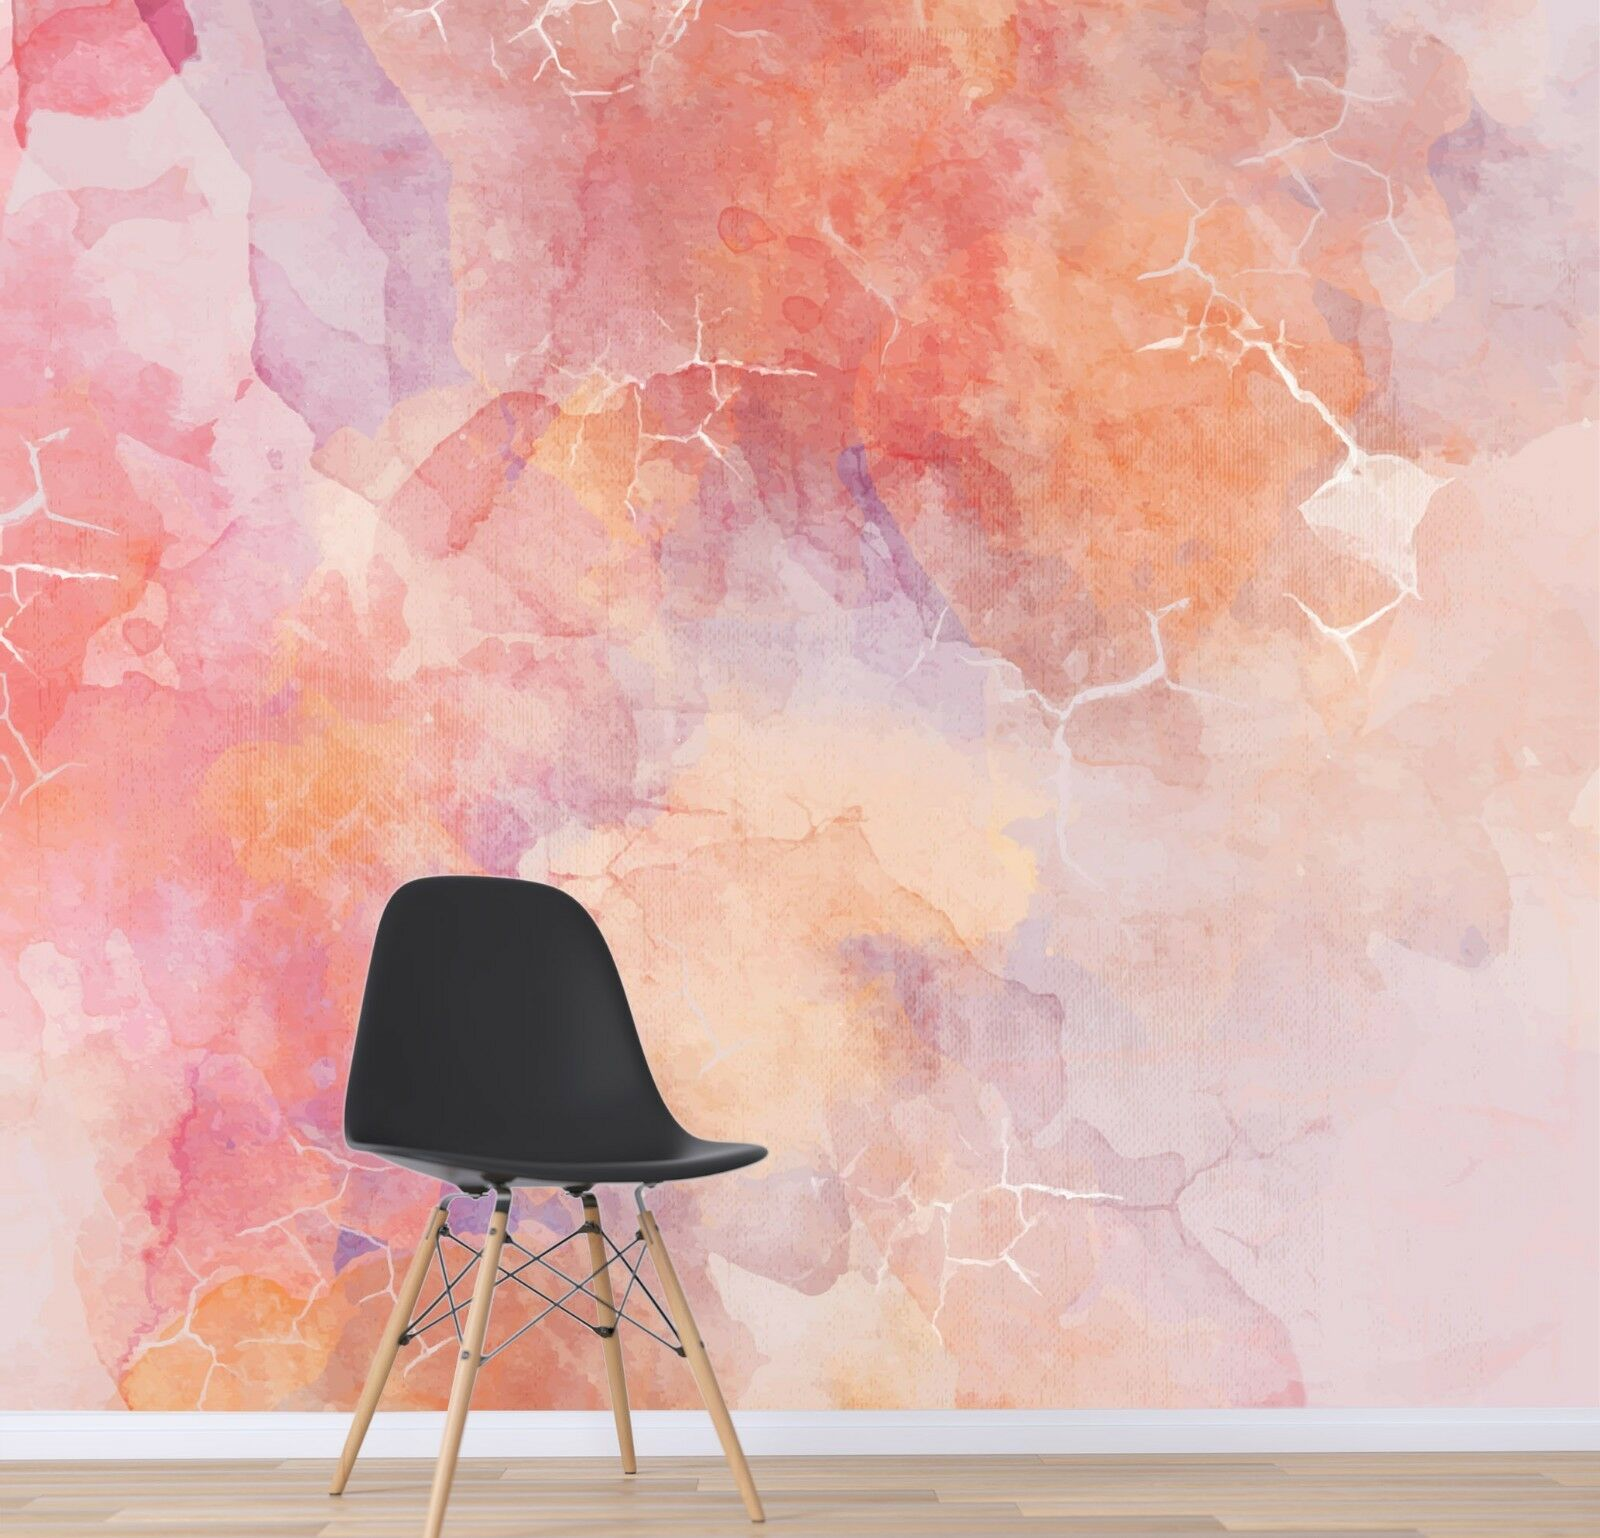 3D Beautiful Pink Texture 54 Wallpaper Murals Wall Print Wallpaper Mural AJ WALL